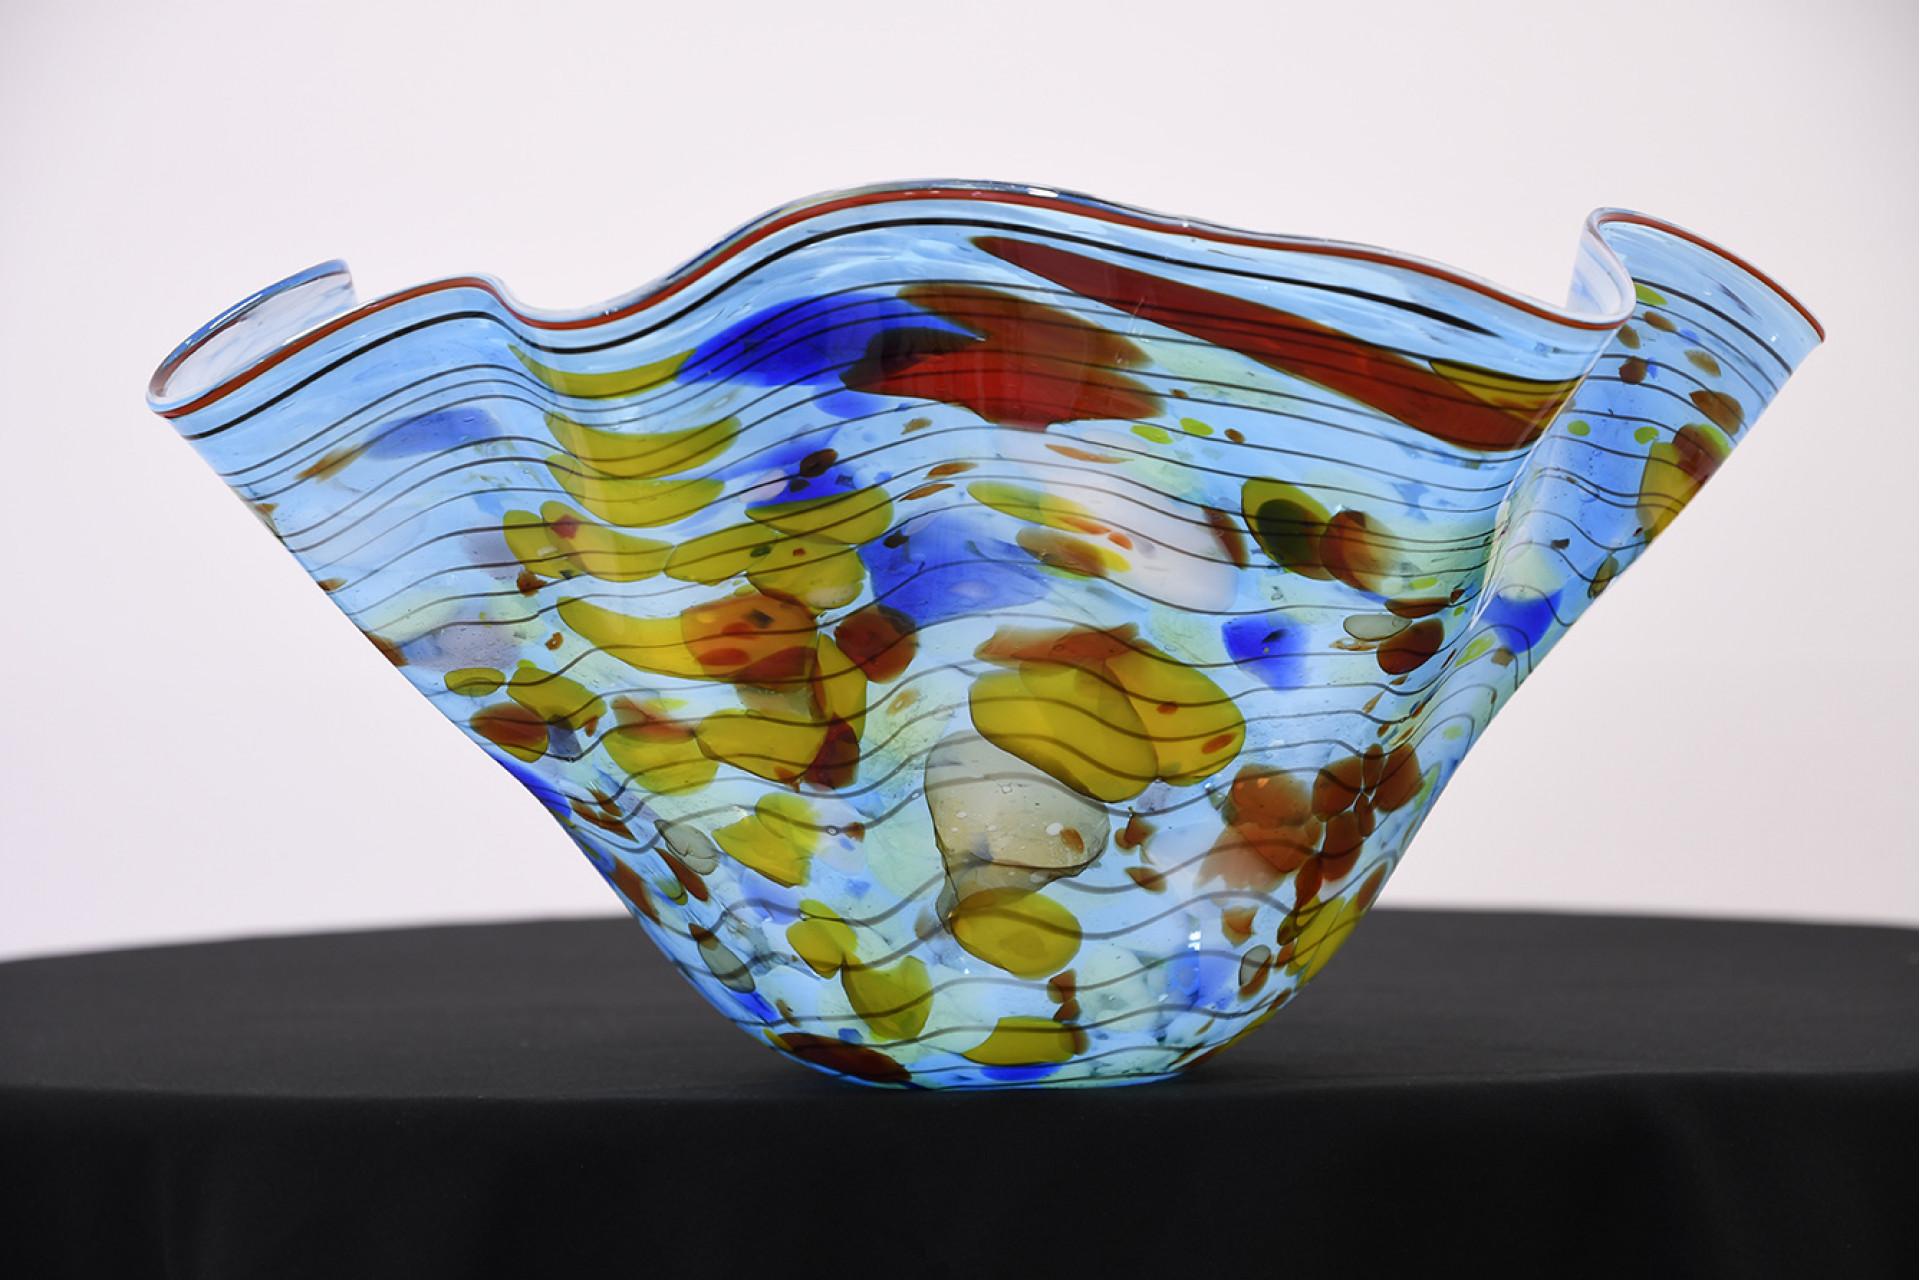 HAND MADE GLASS ART BOWL